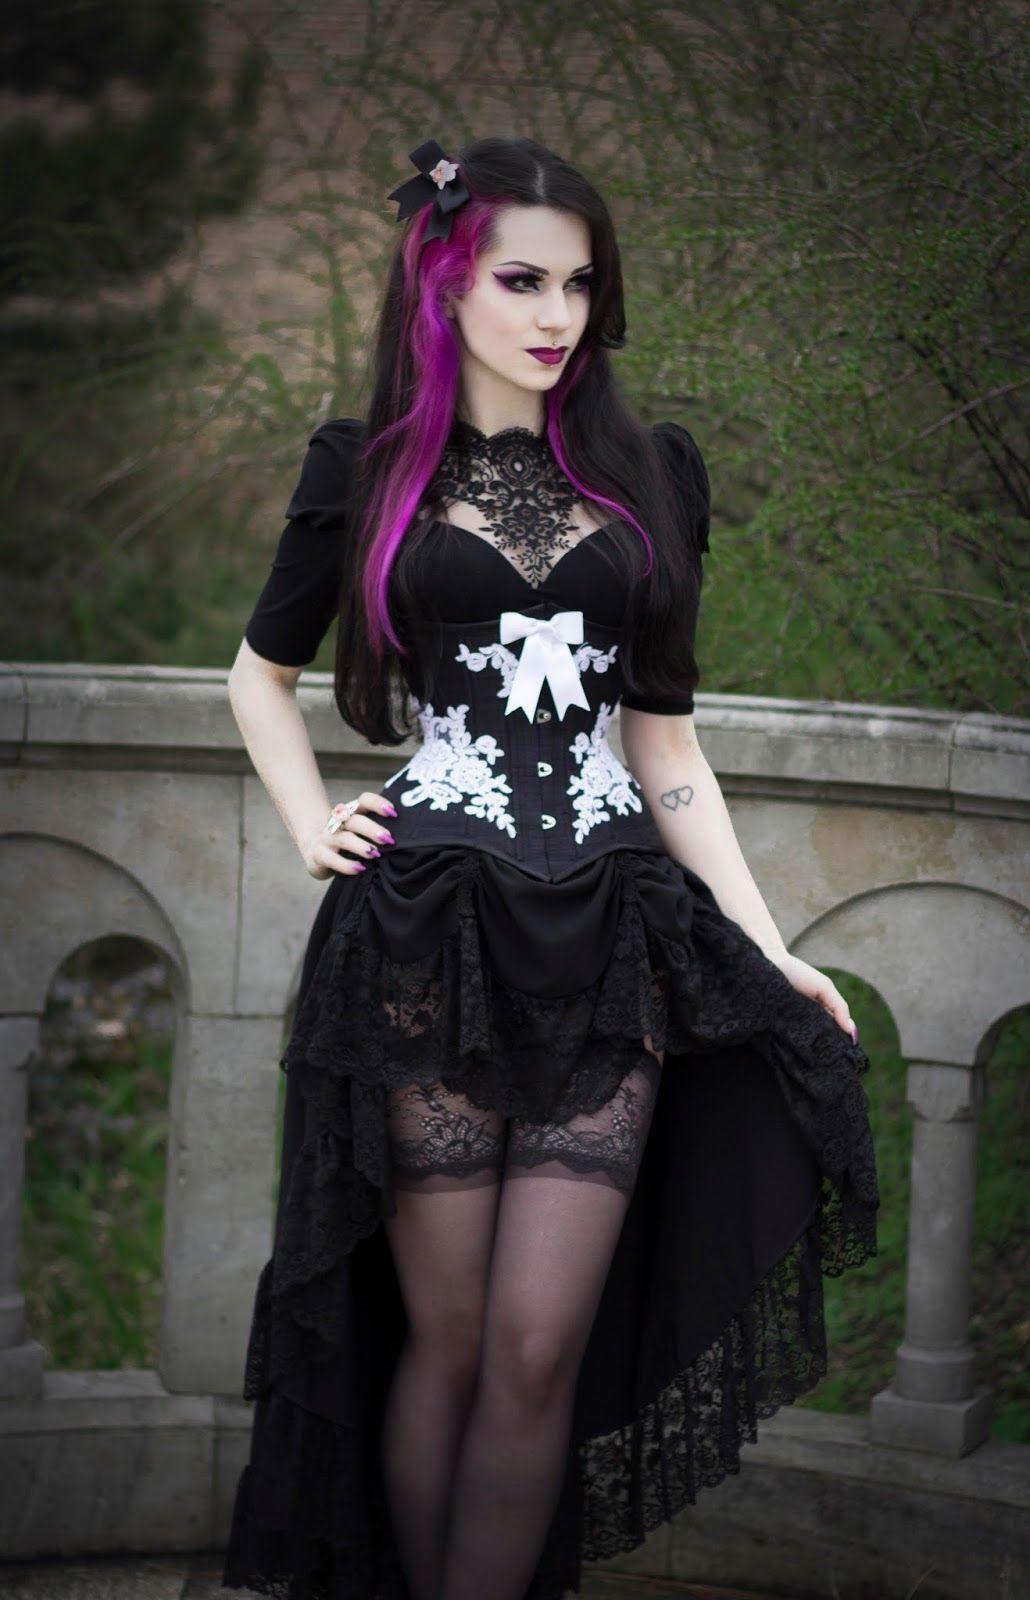 Milena Grbovic | Grufti-kleid, Gothic mode, Modestil